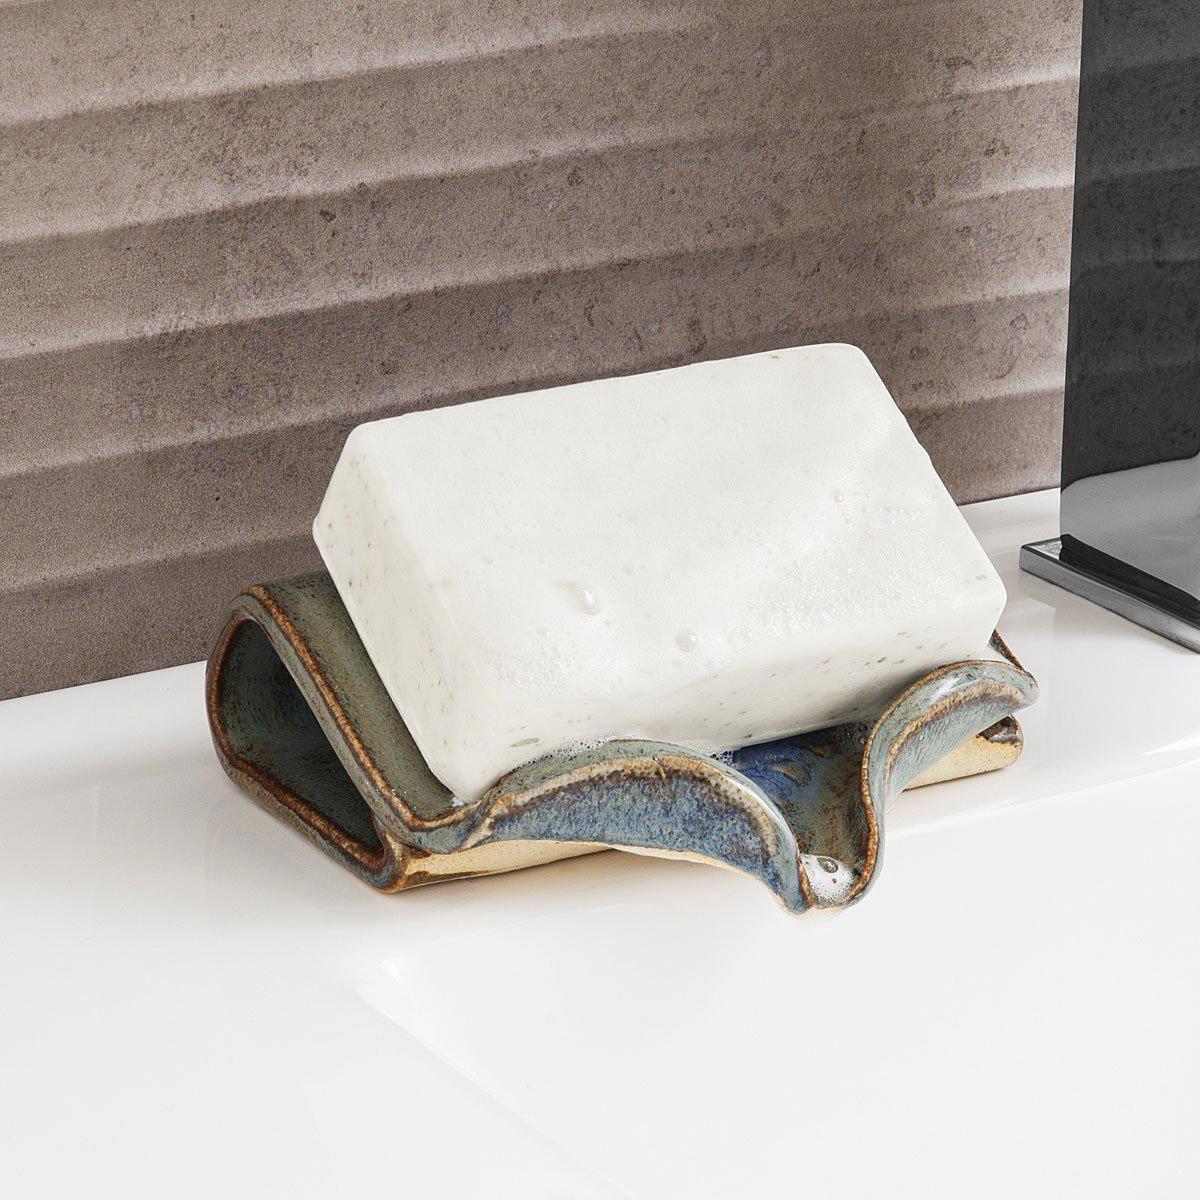 Ceramic Self-Draining Soap Dish | Handmade Bathroom Decor; Unique Housewarming Gifts #ceramicpottery